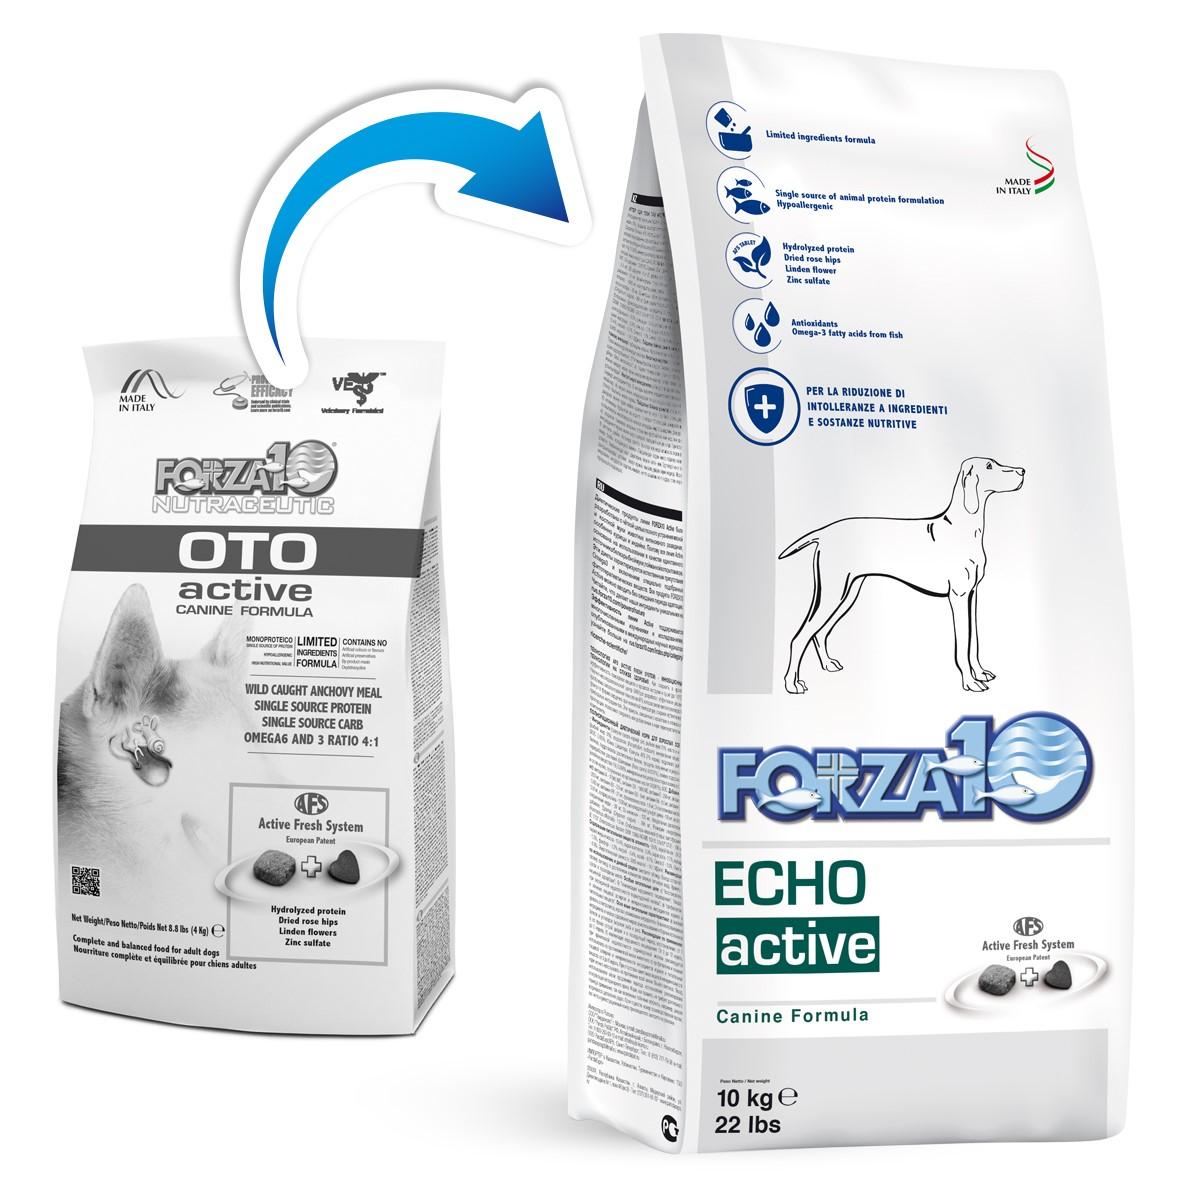 FORZA10 Echo Active